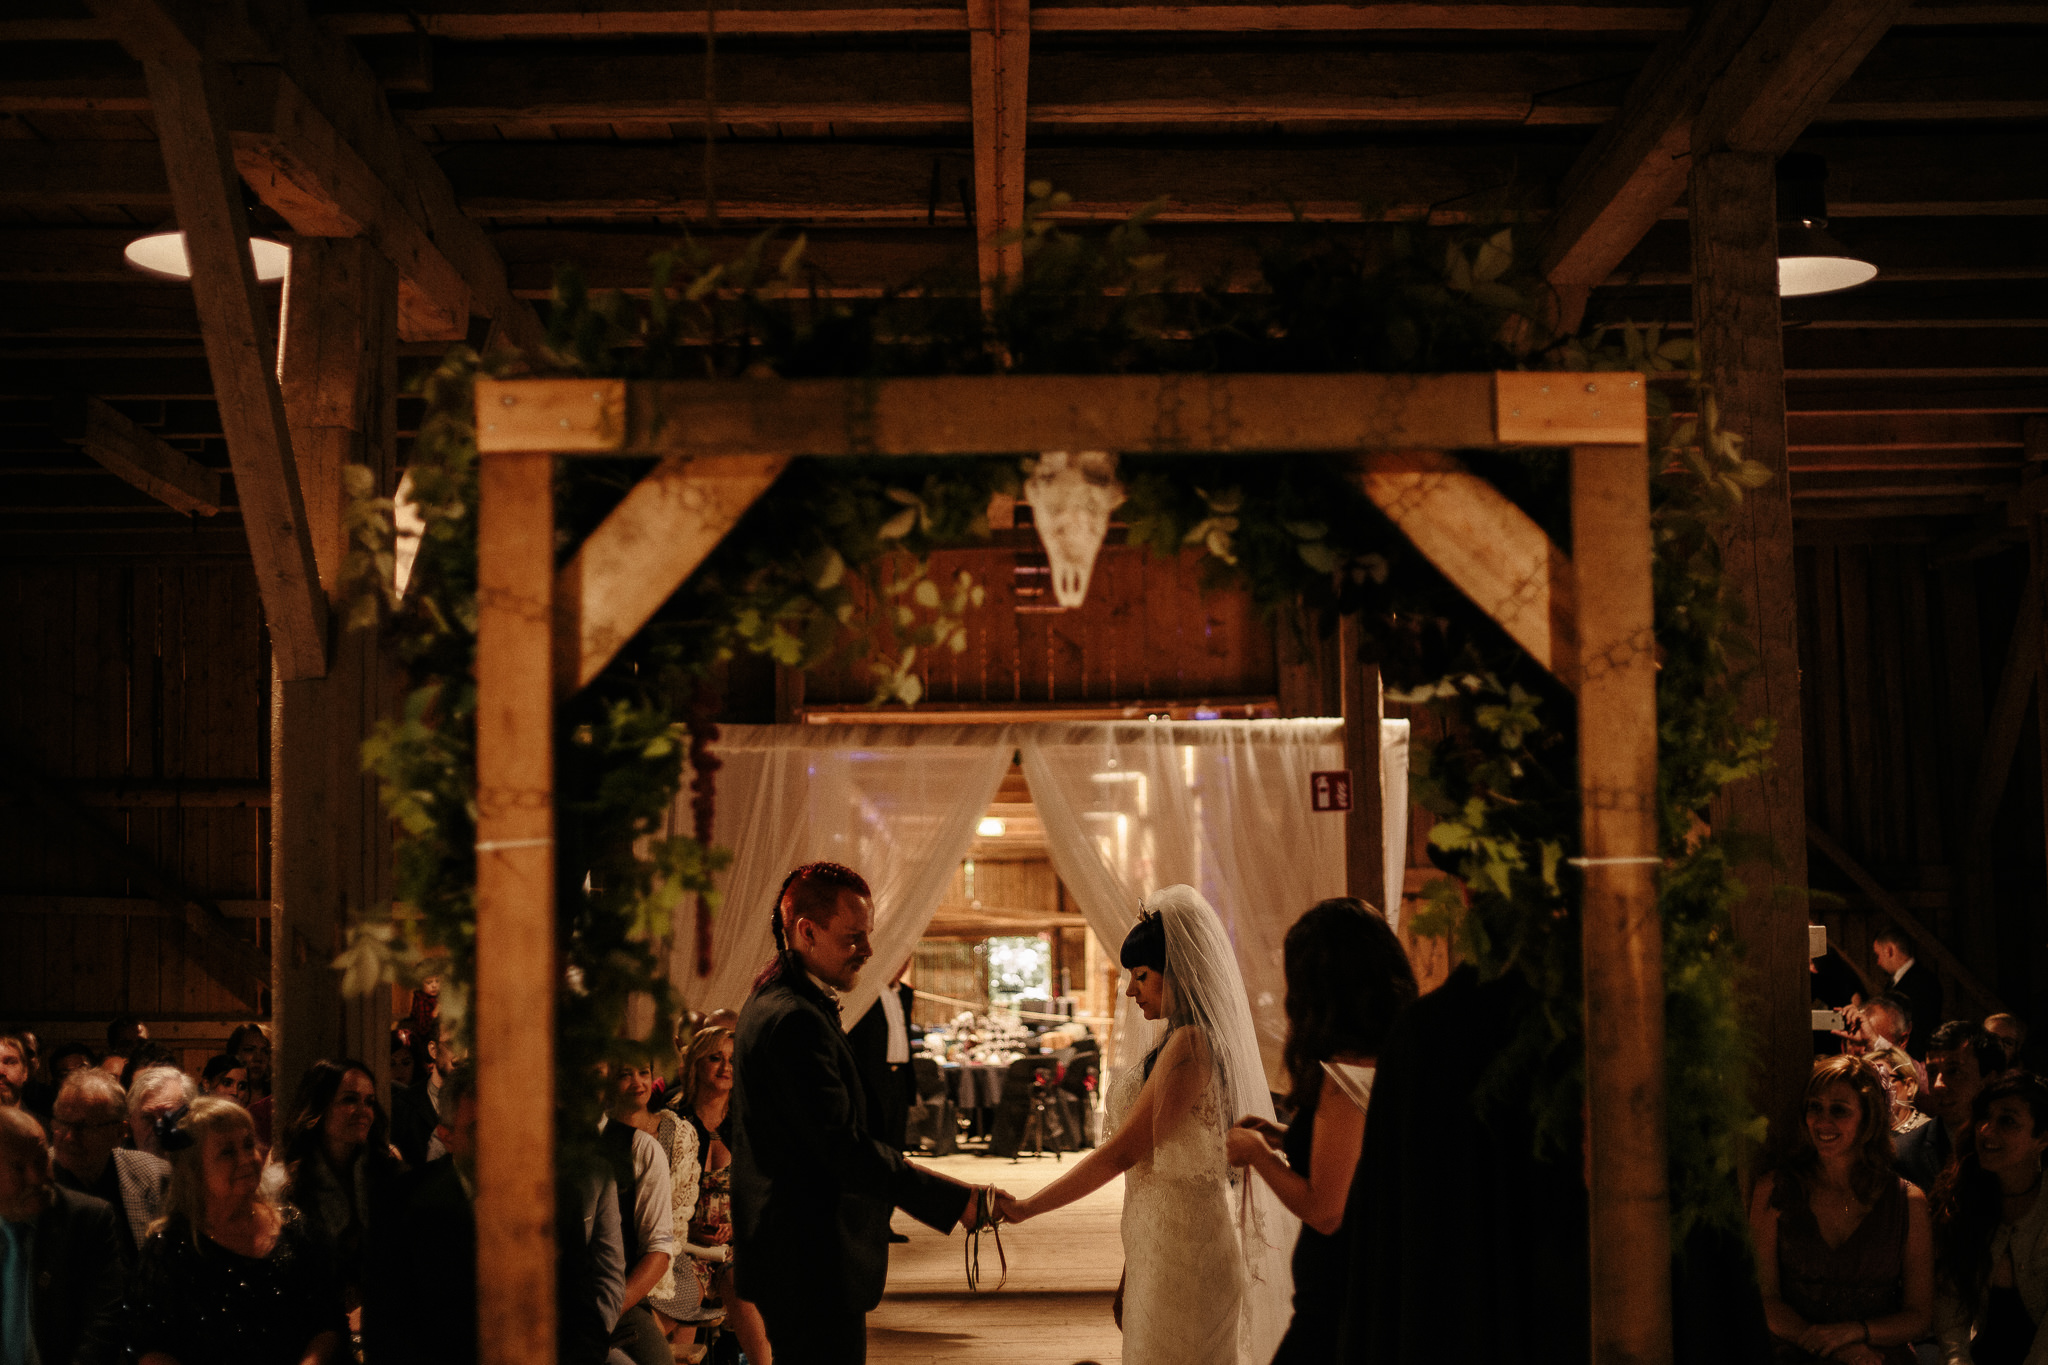 Ceren & Jani - Finland Wedding Photographer - Weddings by Qay - Wedding Photographer (107 of 166).jpg